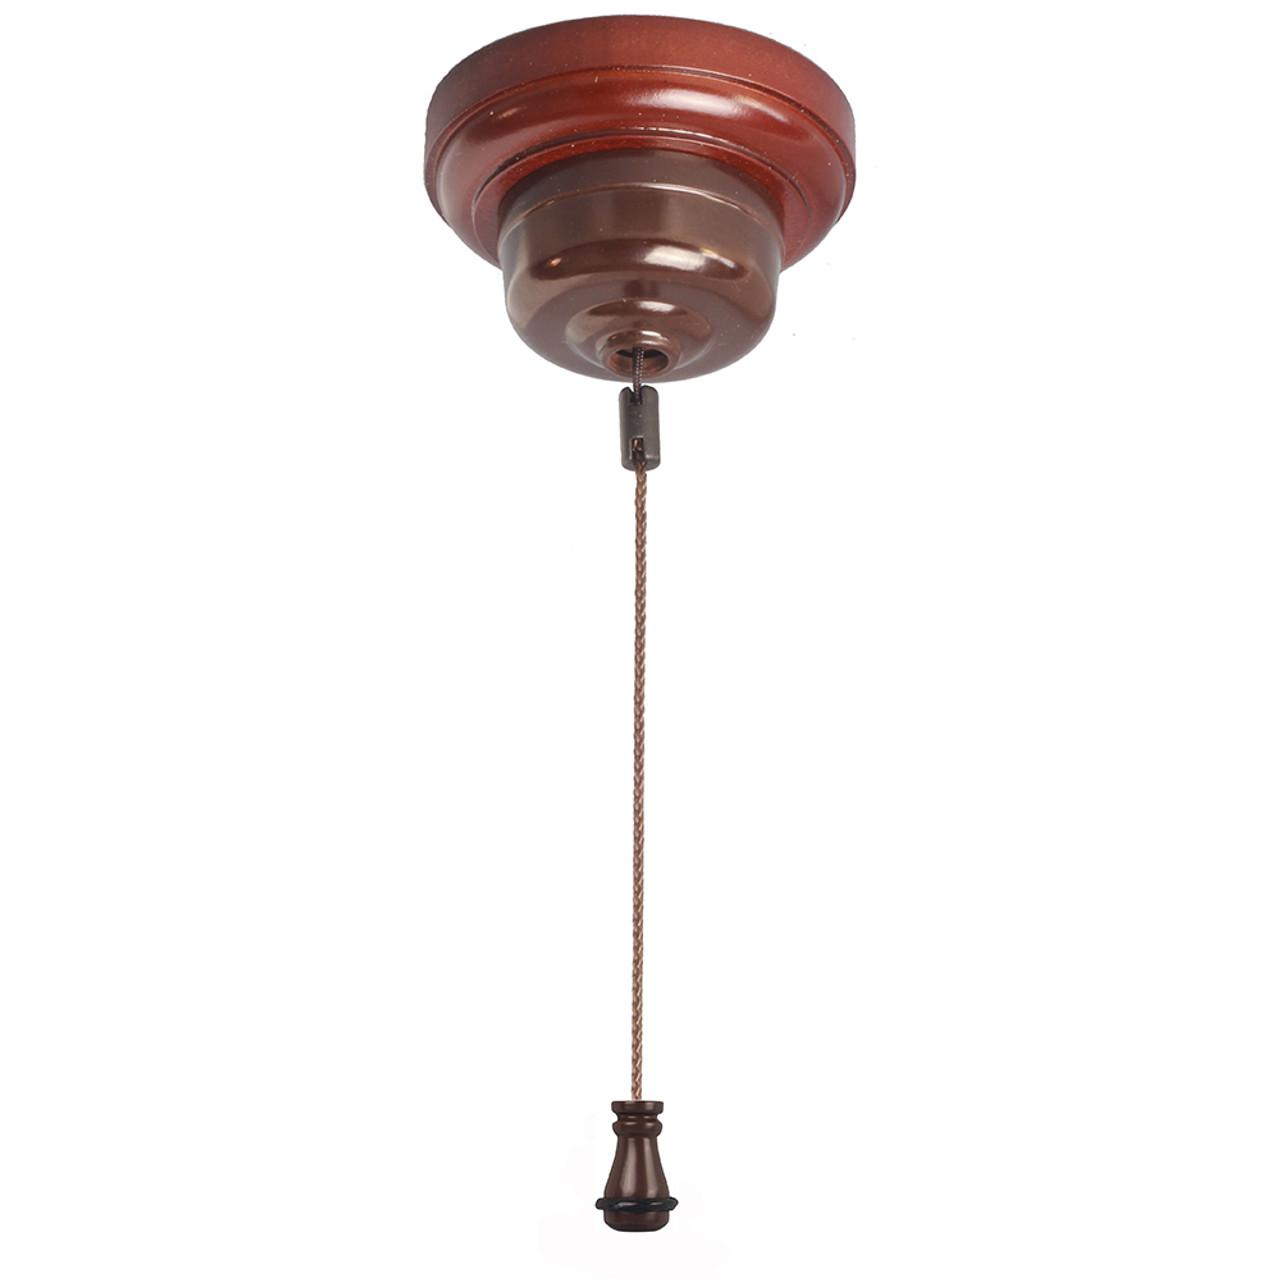 Bakelite Ceiling Pull Cord Switch